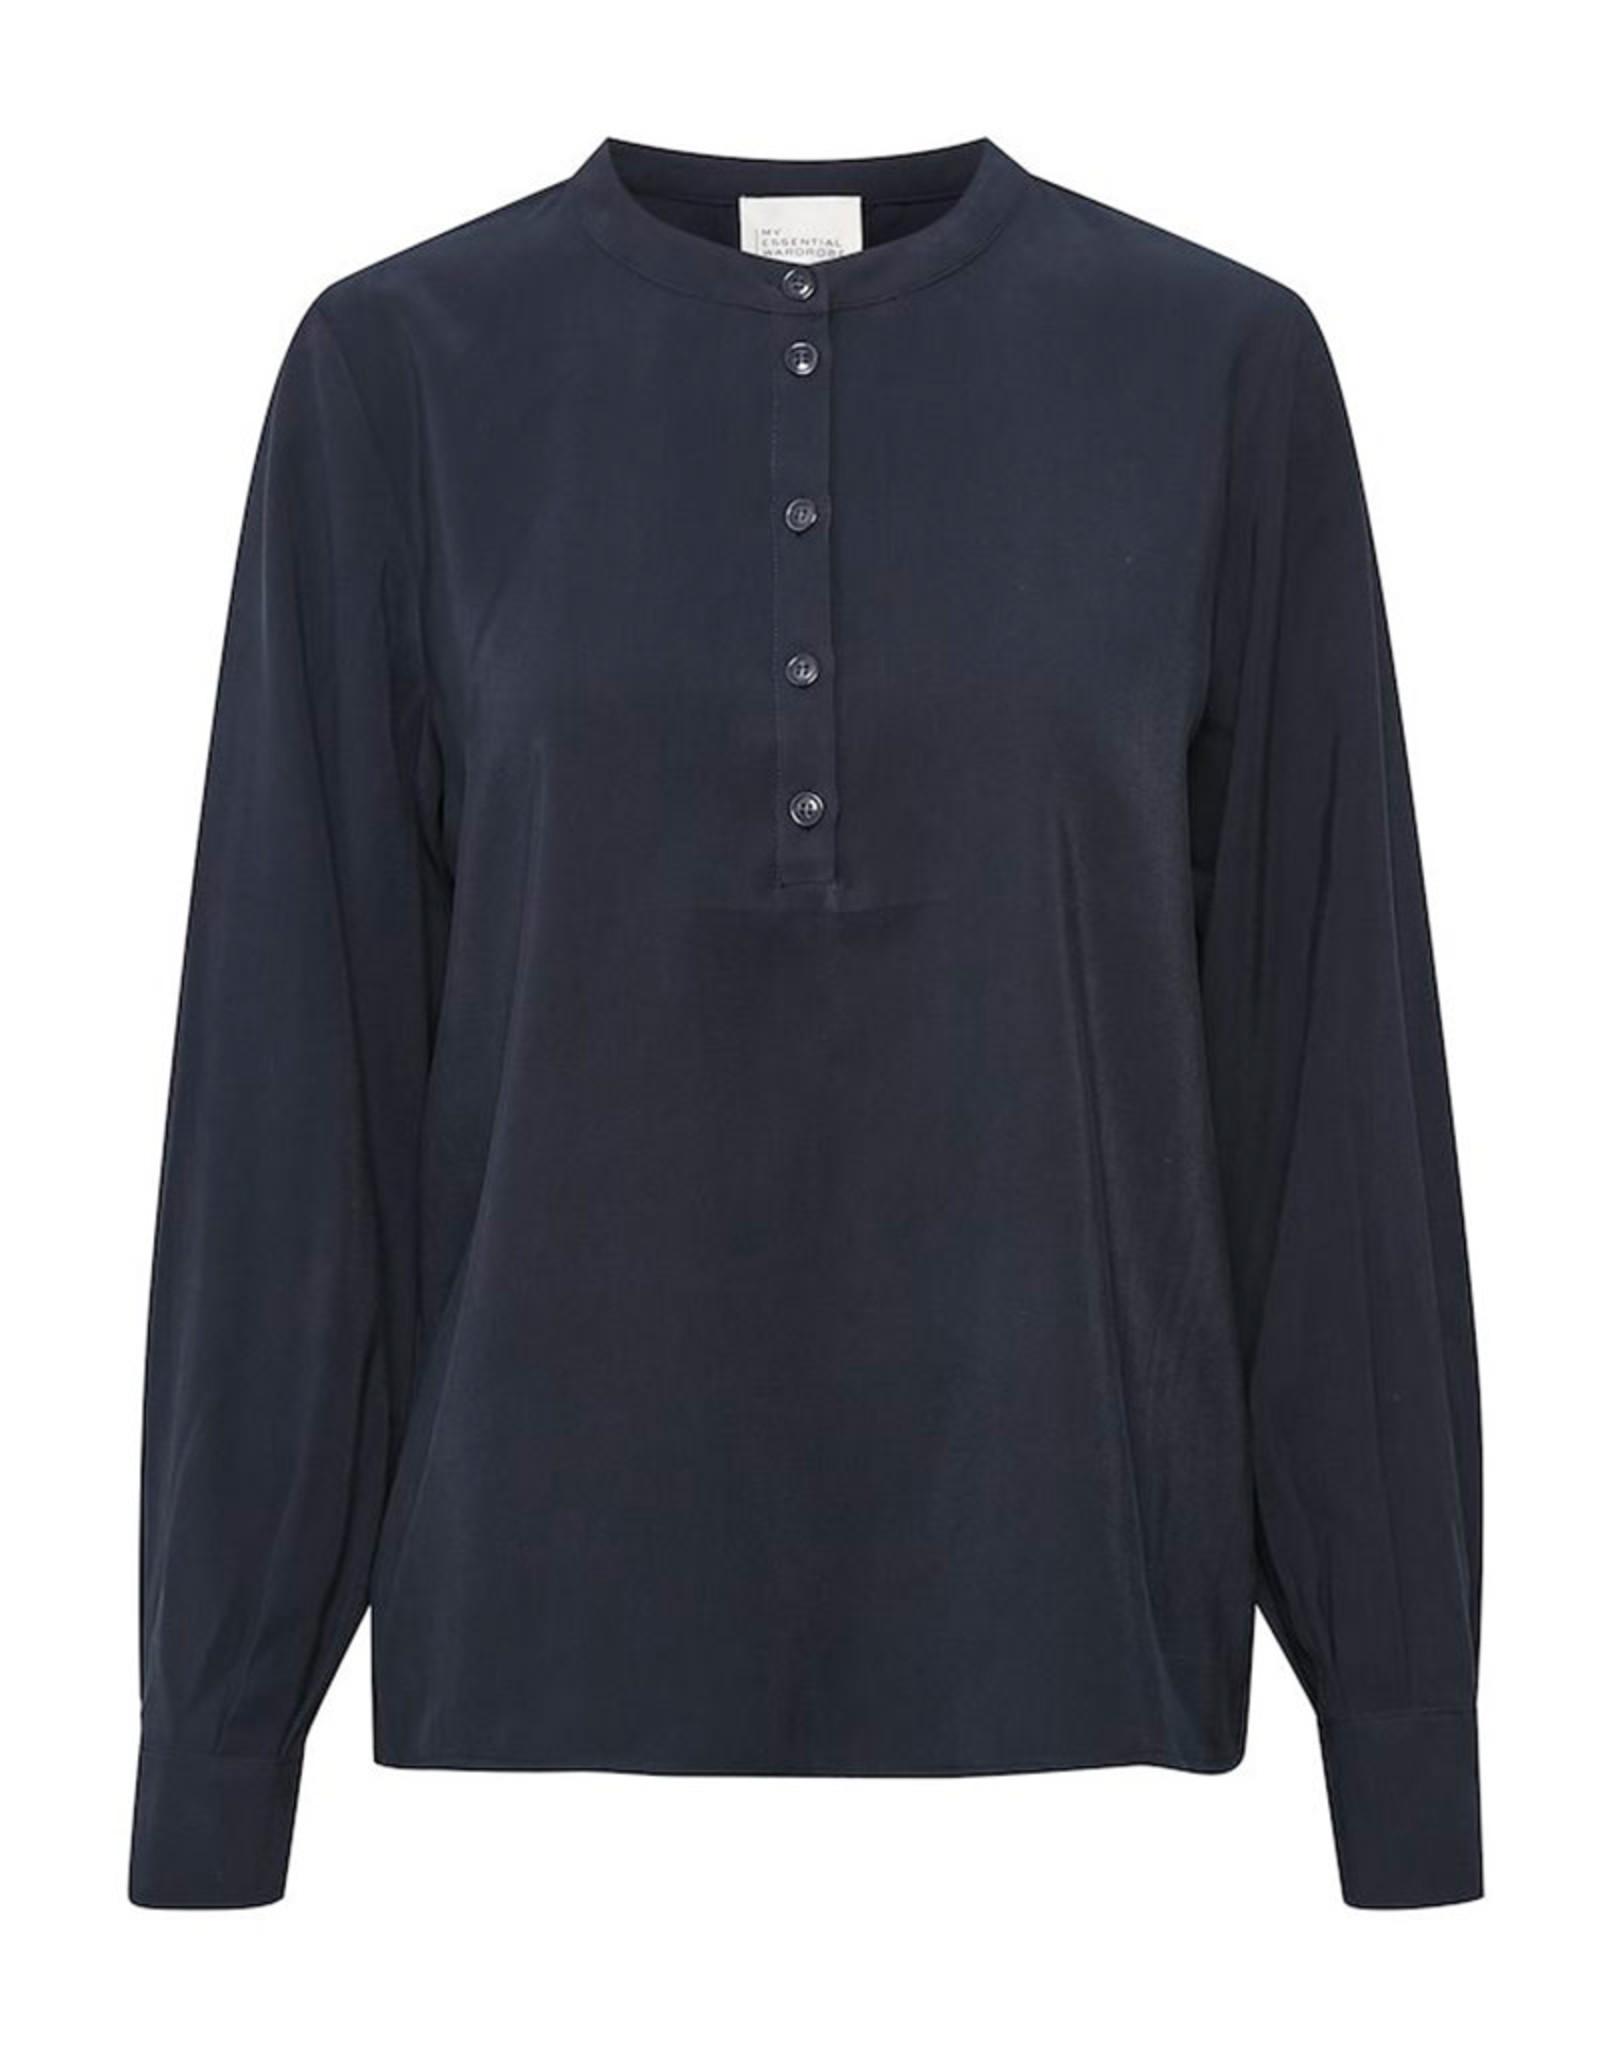 My Essential Wardrobe Louisa Iris Blouse